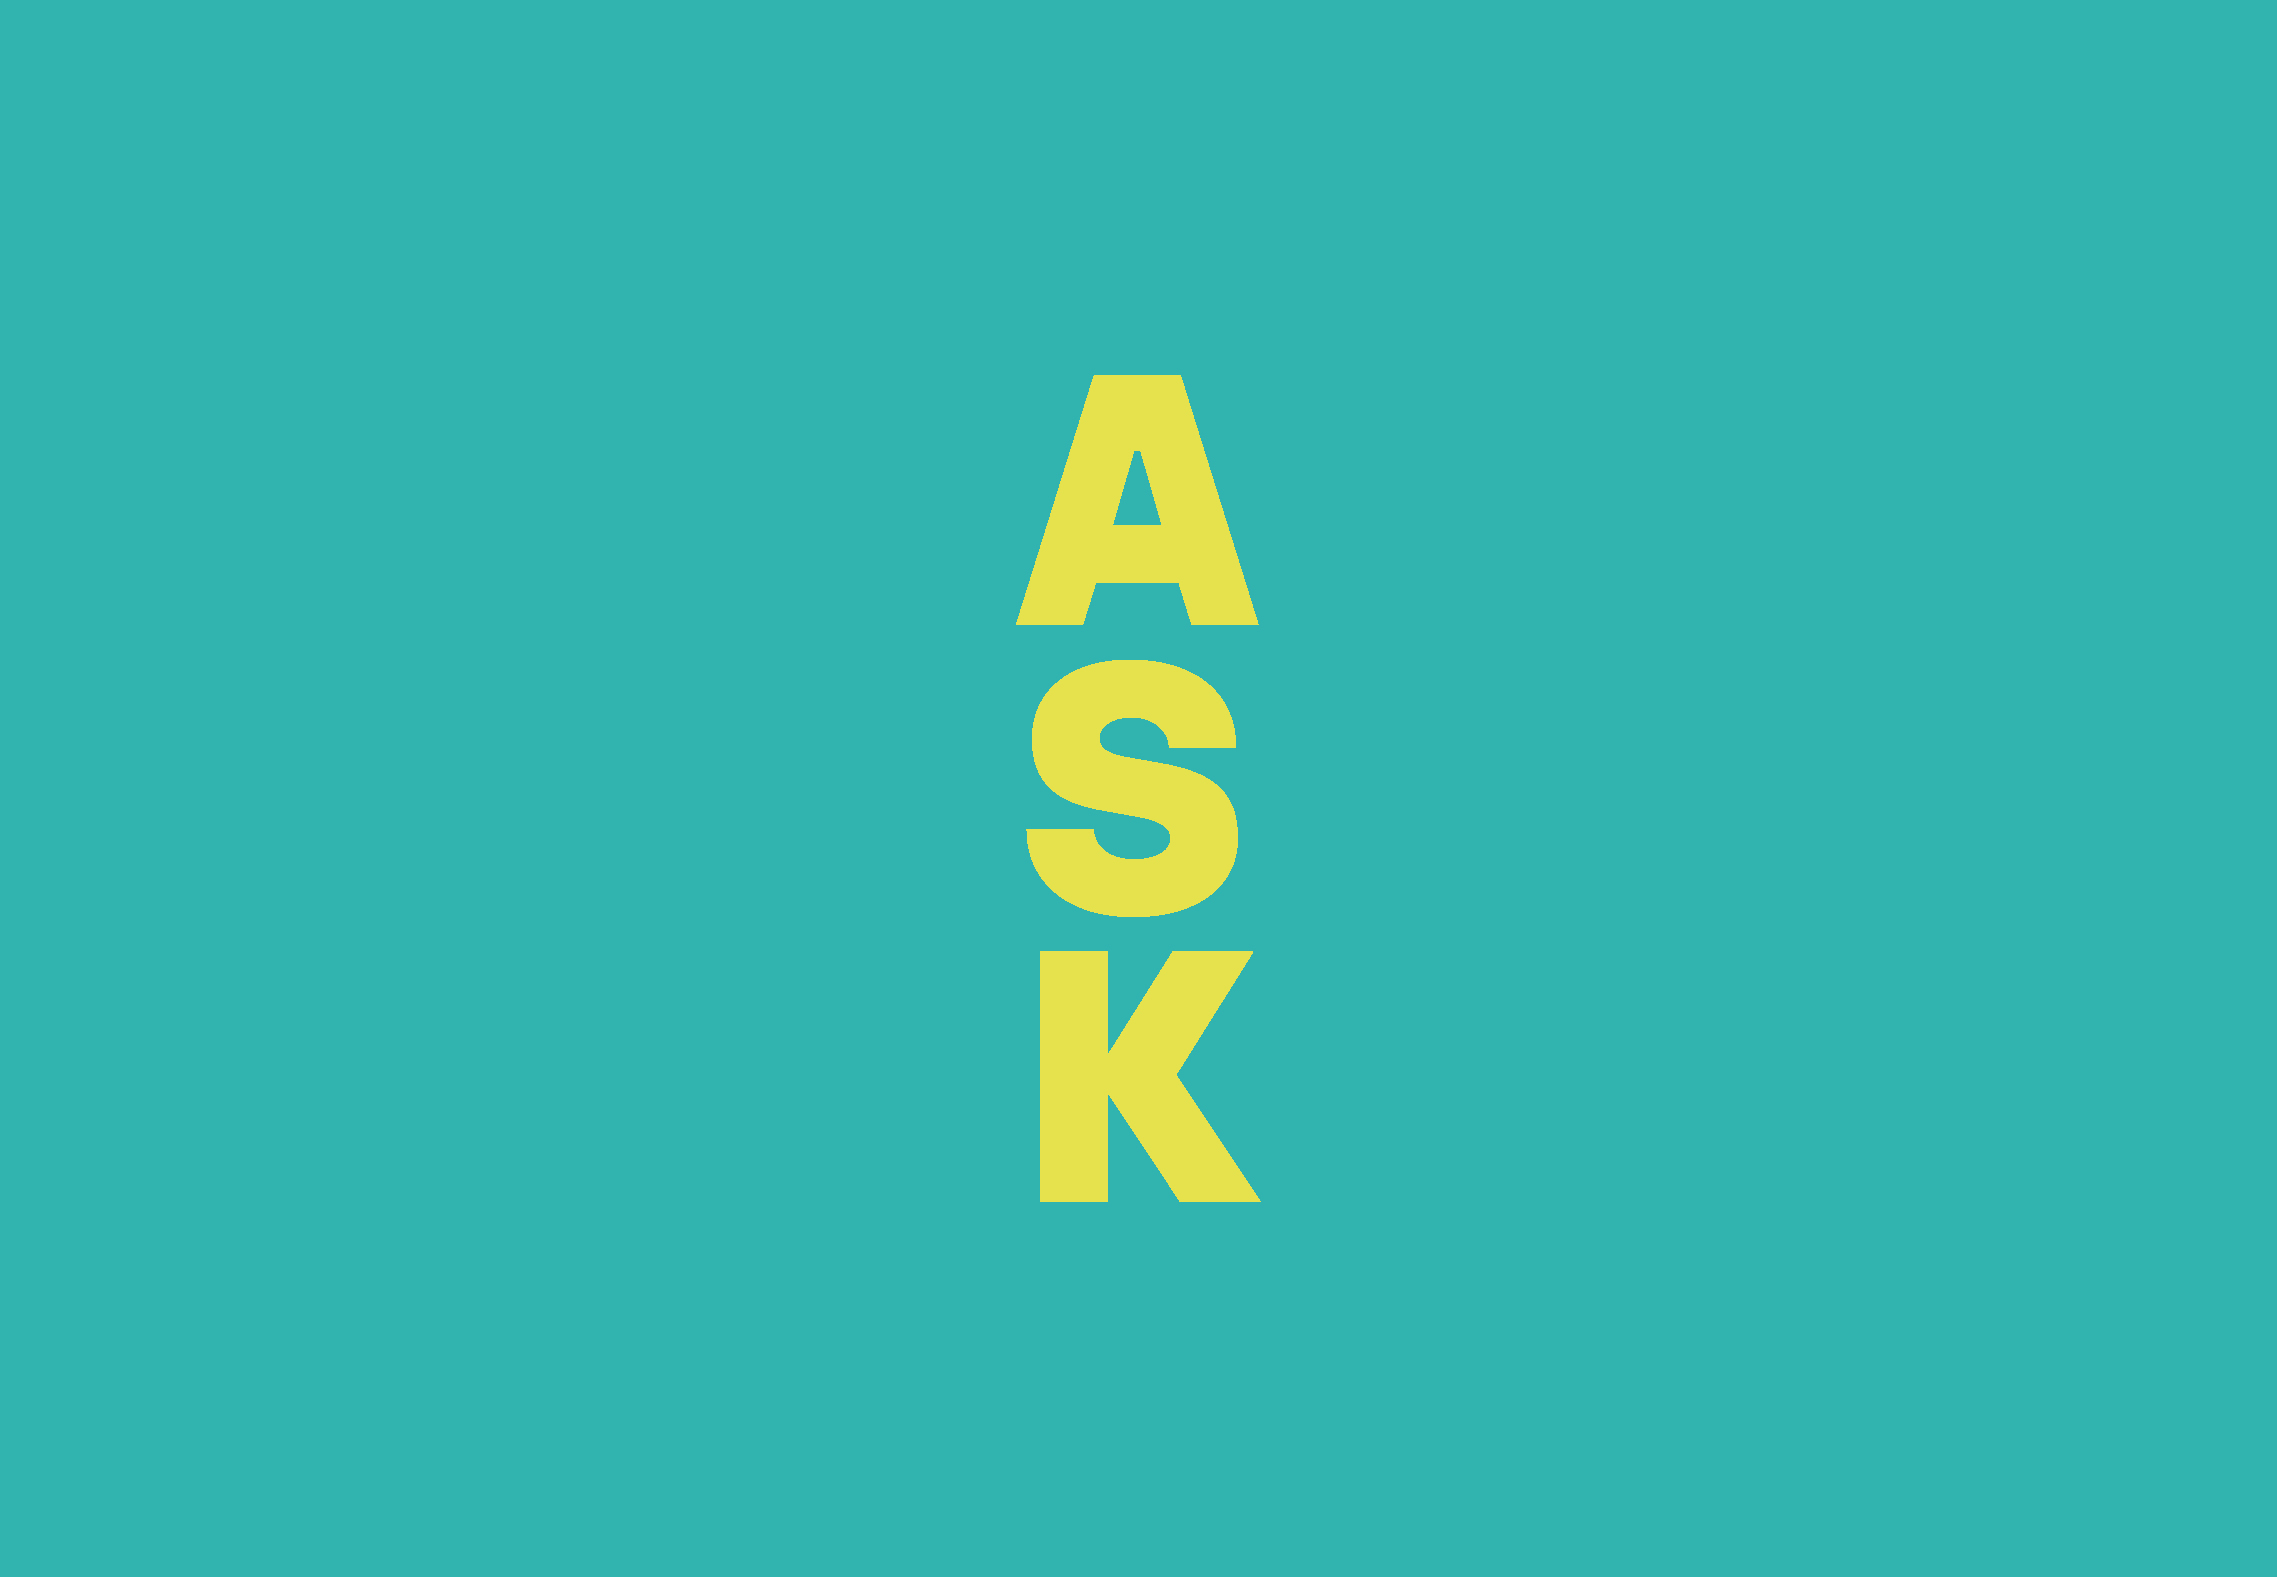 ASK branding